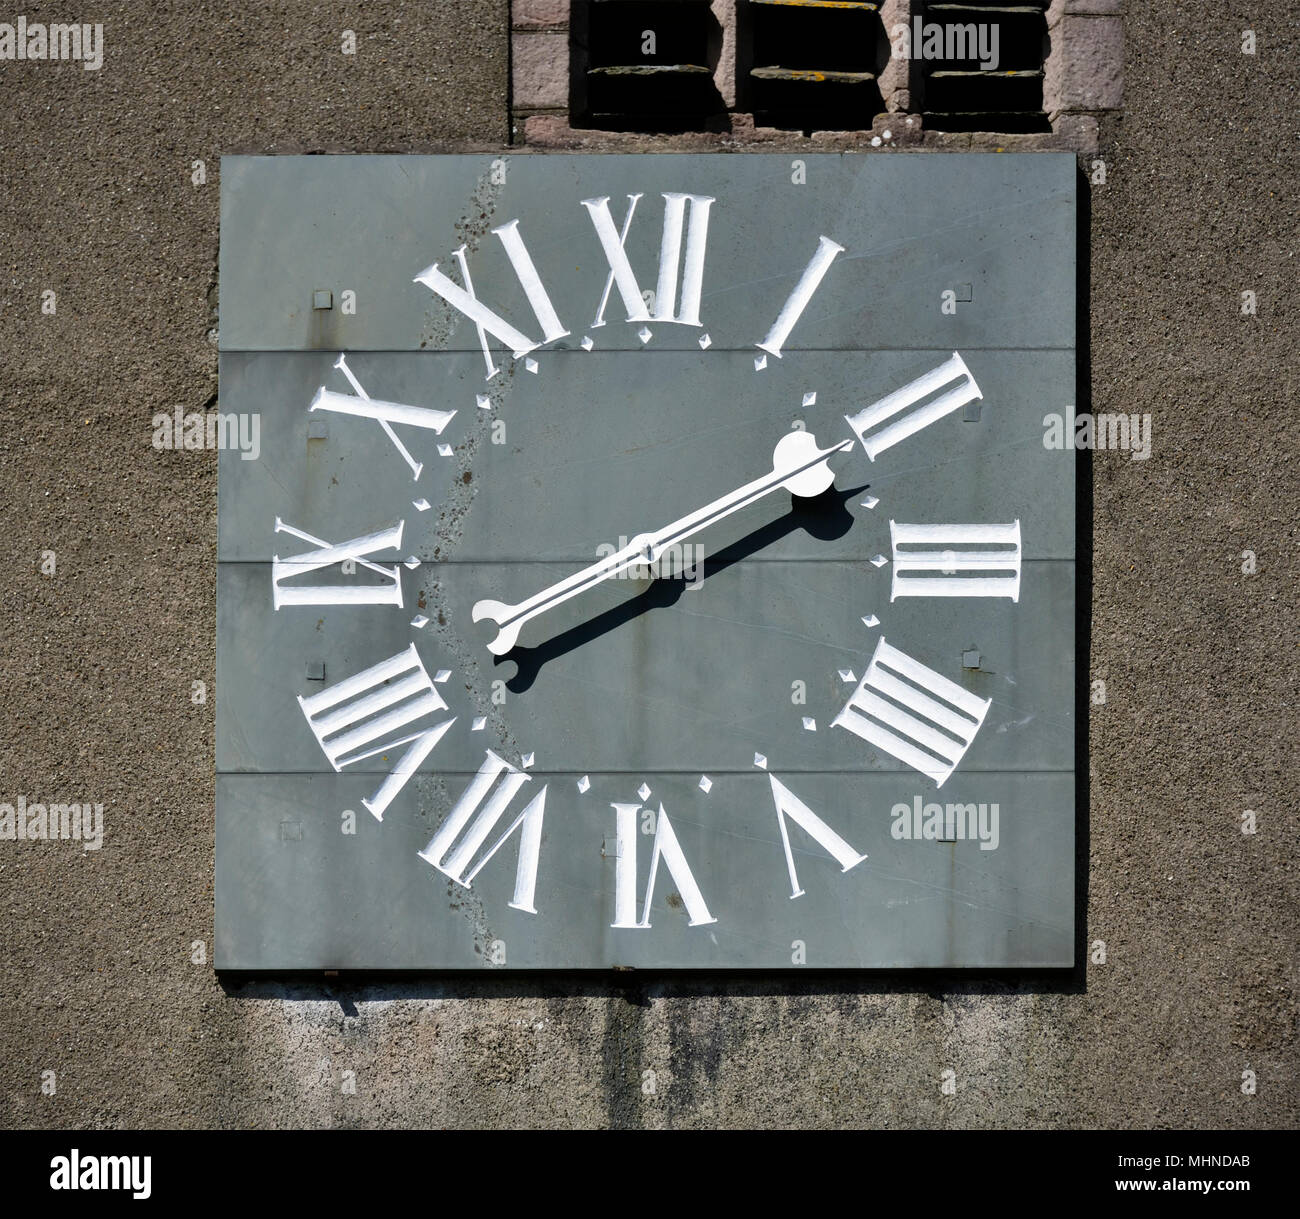 One-handed clock with Roman numerals. Parish Church of Saint Kentigern, Great Crosthwaite, Lake District National Park, Cumbria, England. - Stock Image